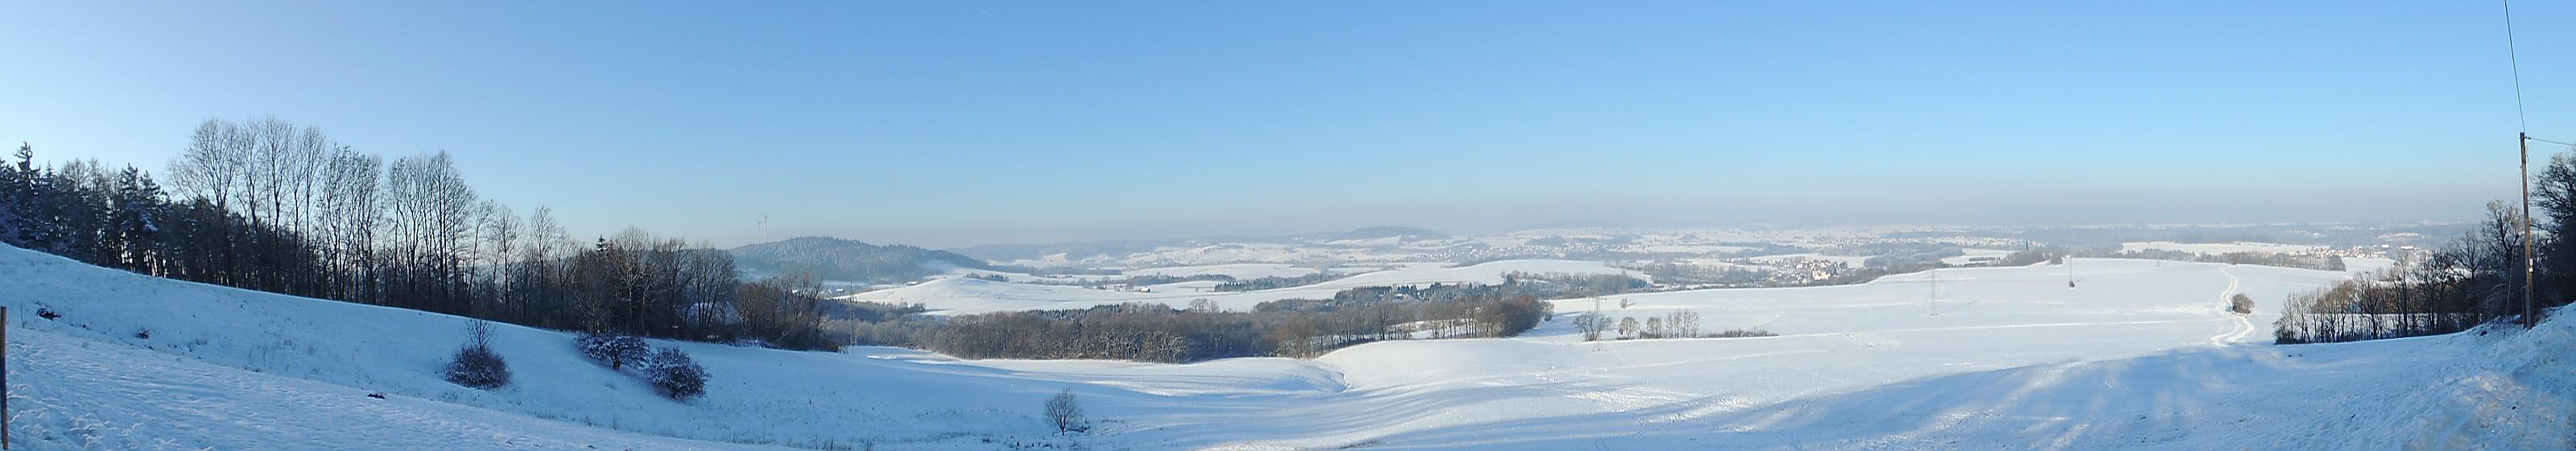 Wintermorgen 005